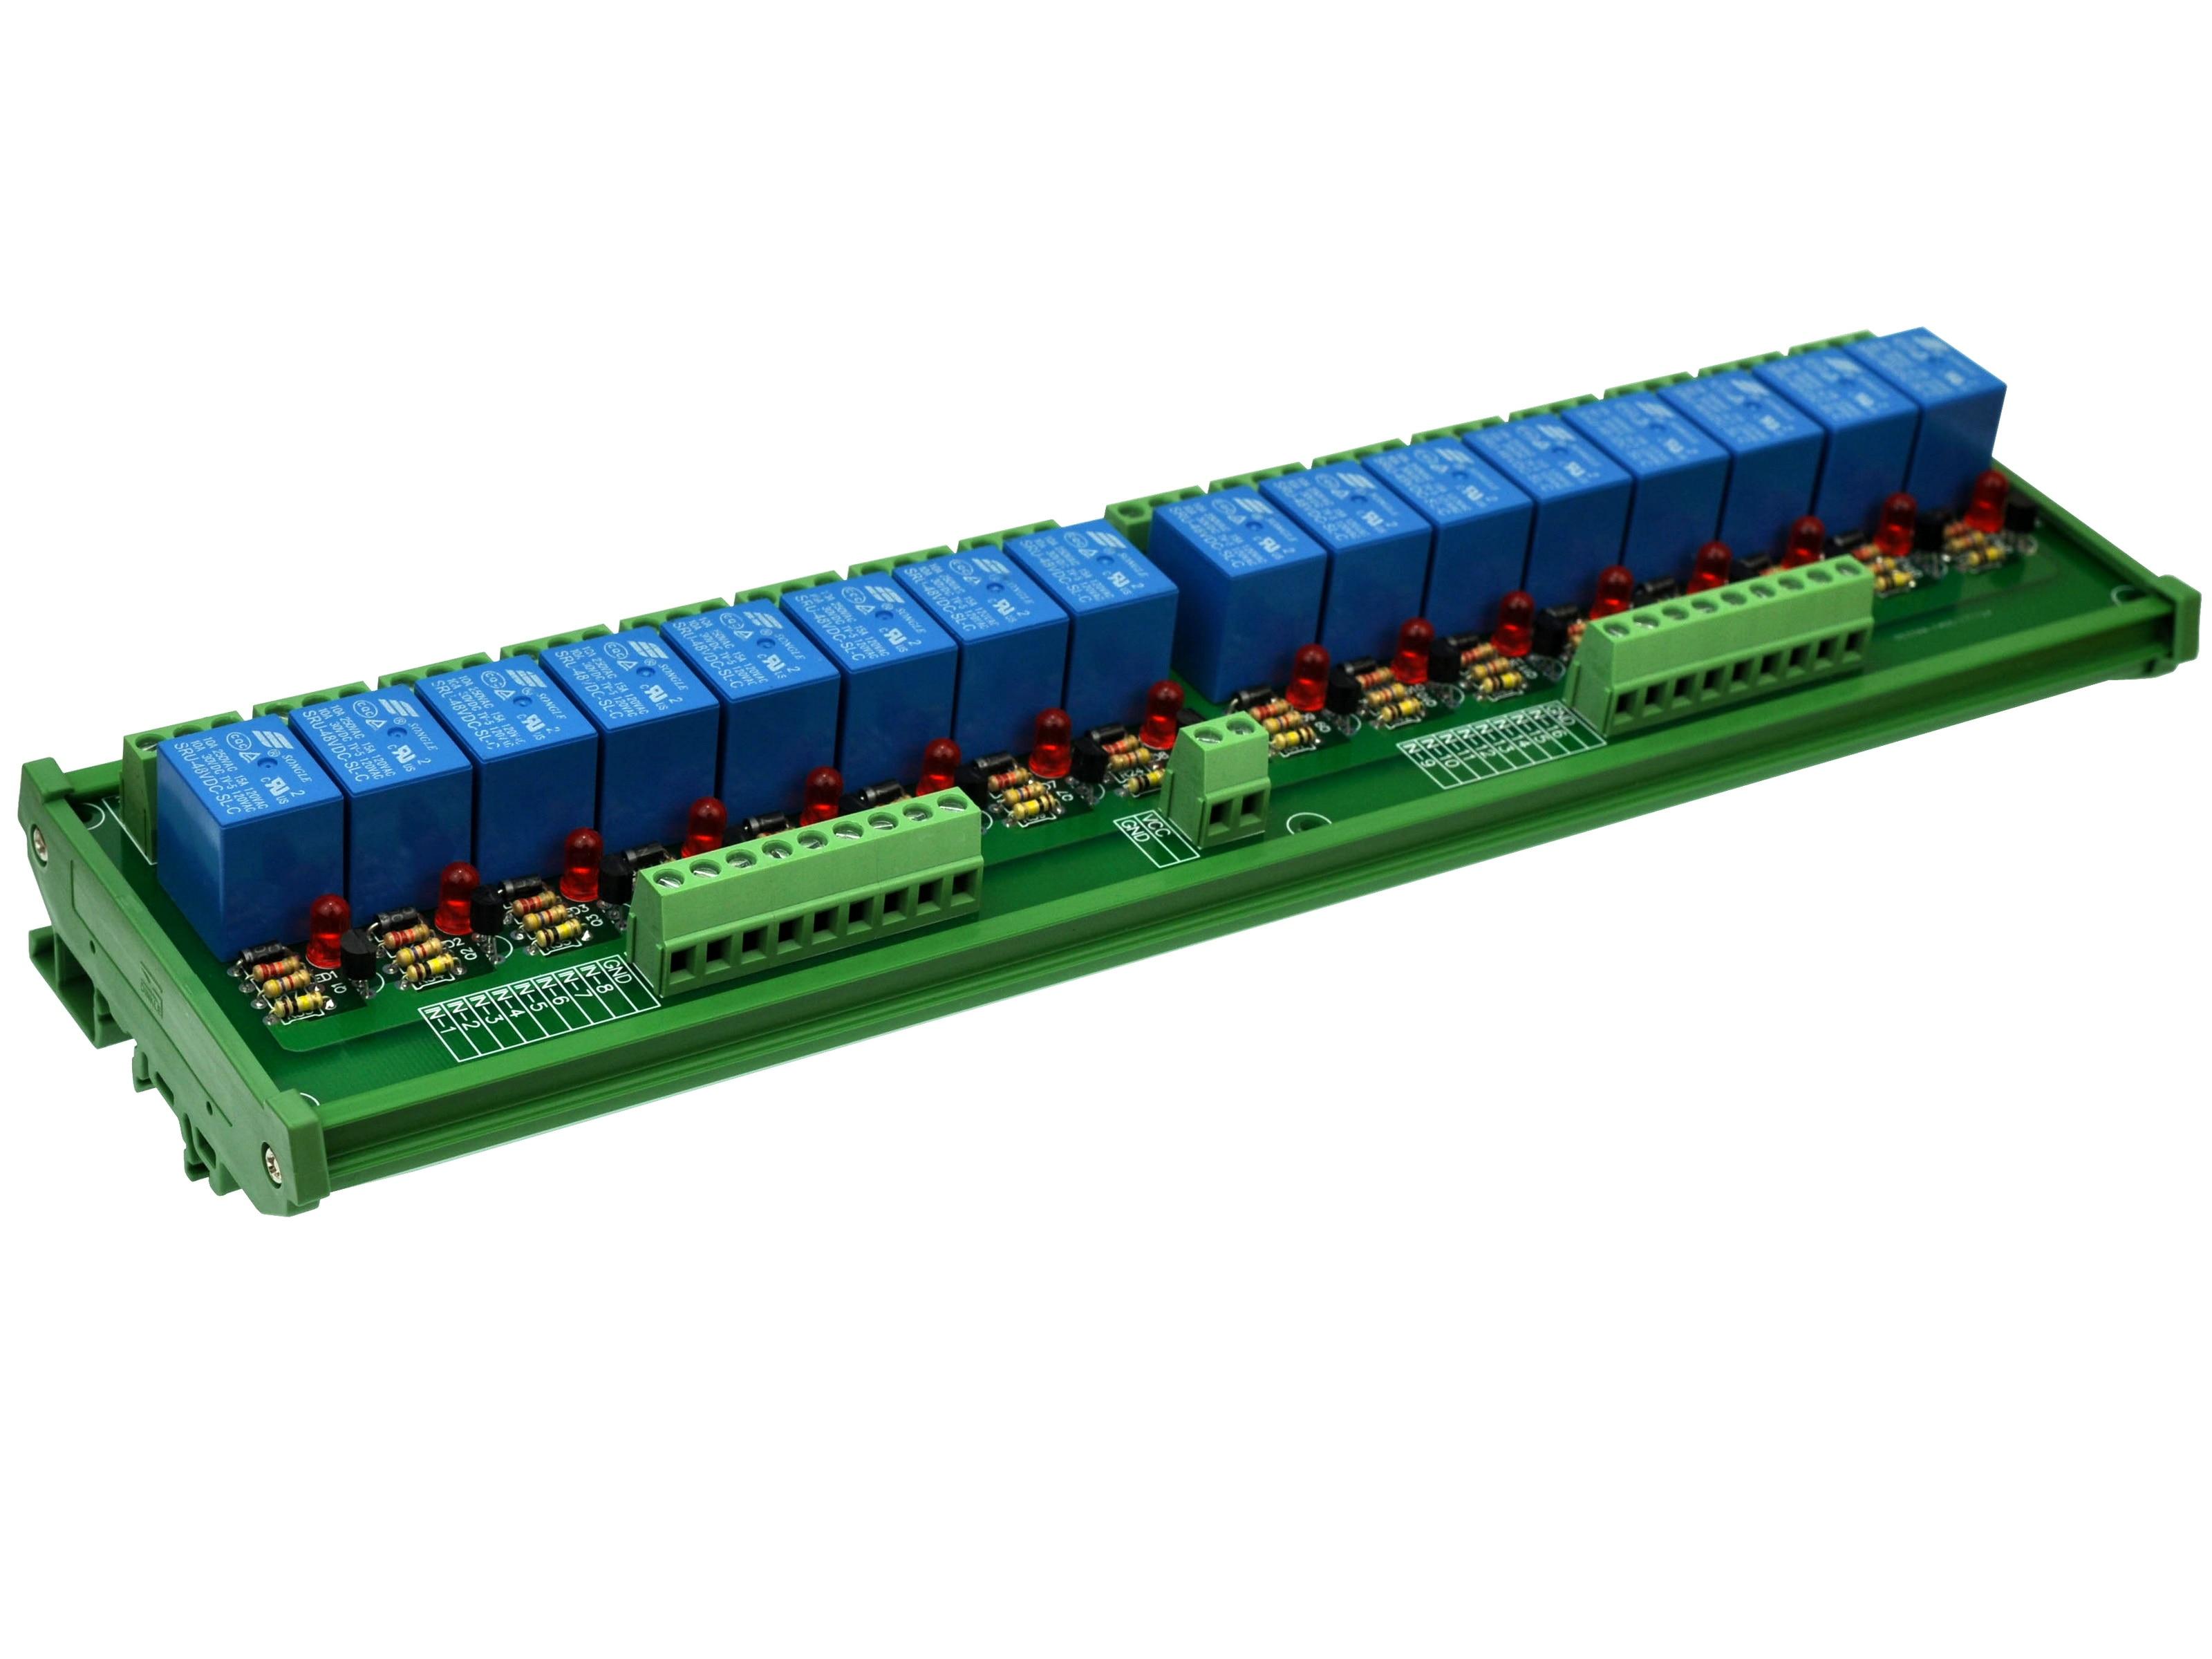 DIN Rail Mount 16 SPDT Power Relay Interface Module,  10A Relay, 48V Coil.